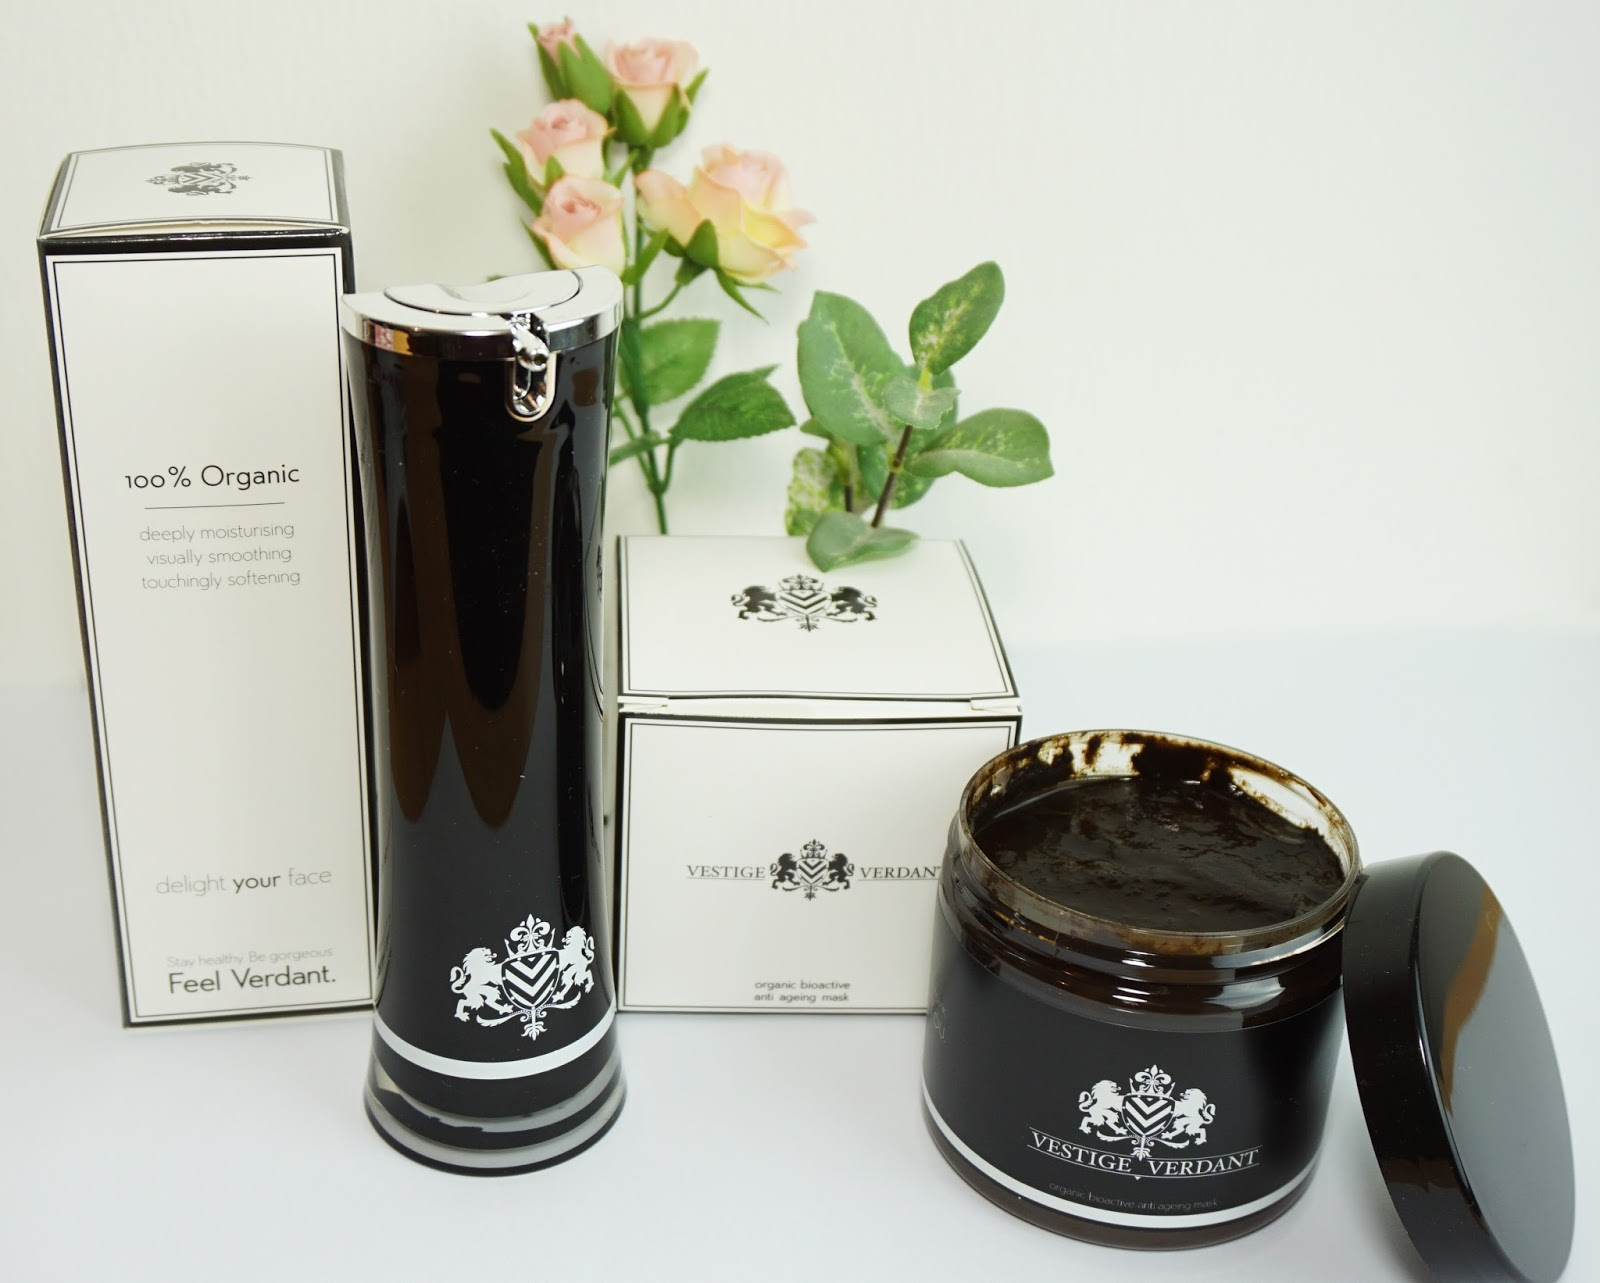 Vestige Verdant - Gesichtsmaske & Gesichtsöl Pretty Clover Beautyblog